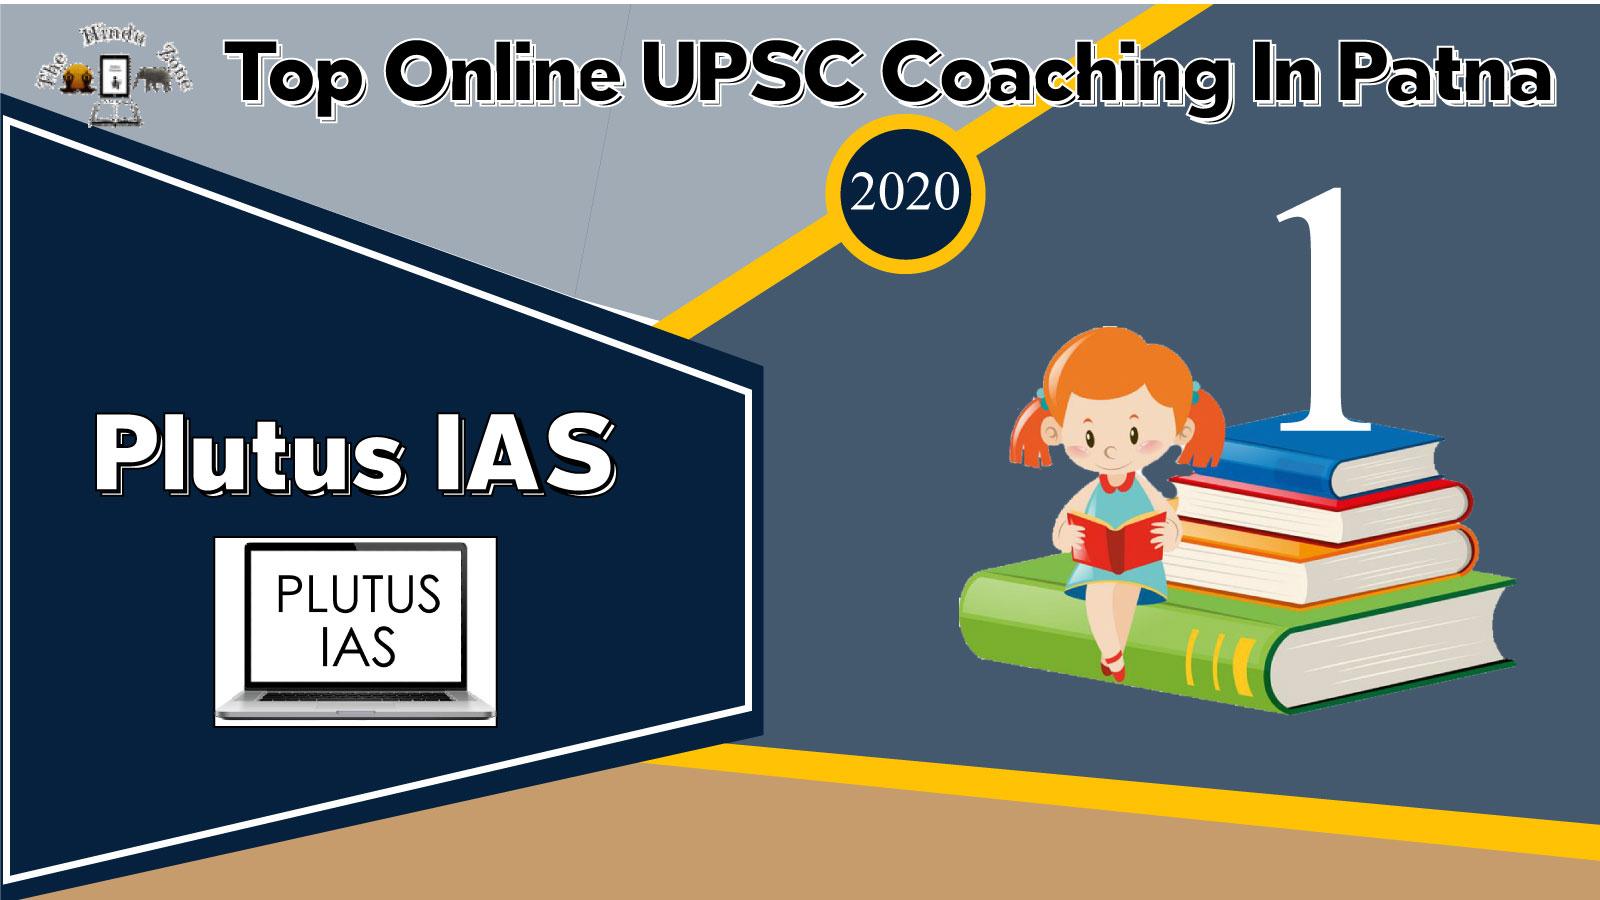 Plutus IAS Online IAS Coaching In Patna